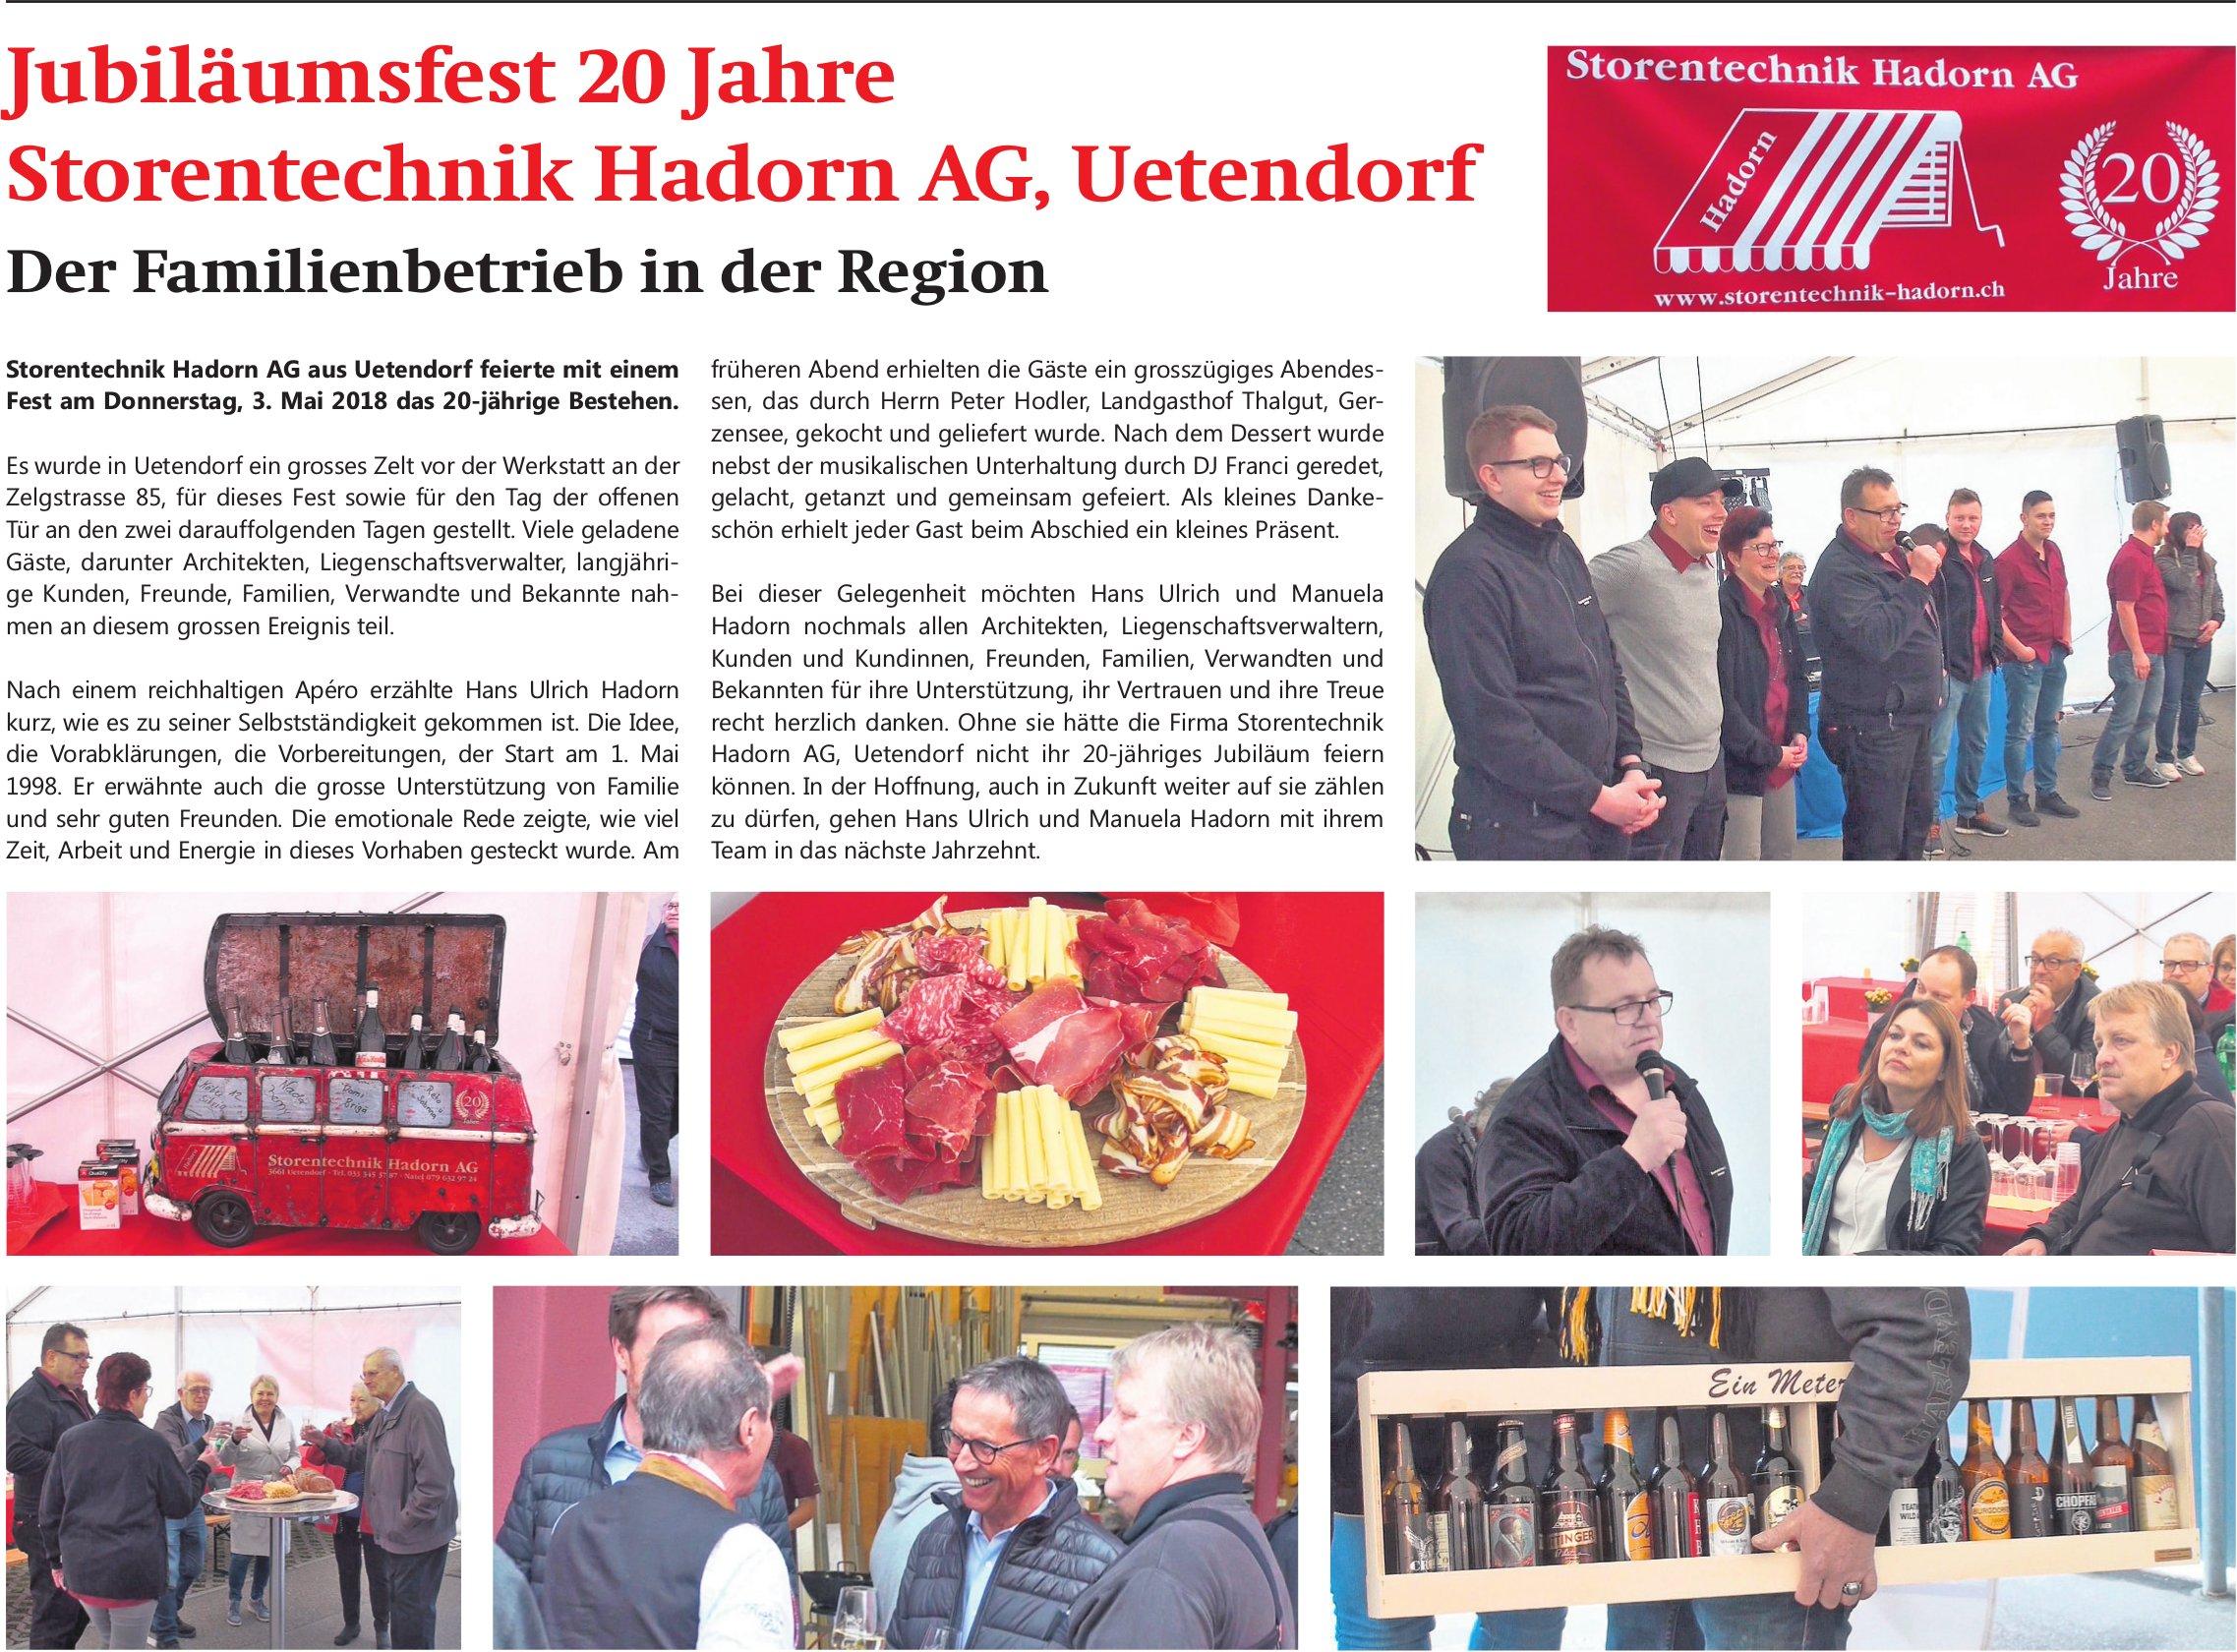 Jubiläumsfest 20 Jahre Storentechnik Hadorn AG, Uetendorf